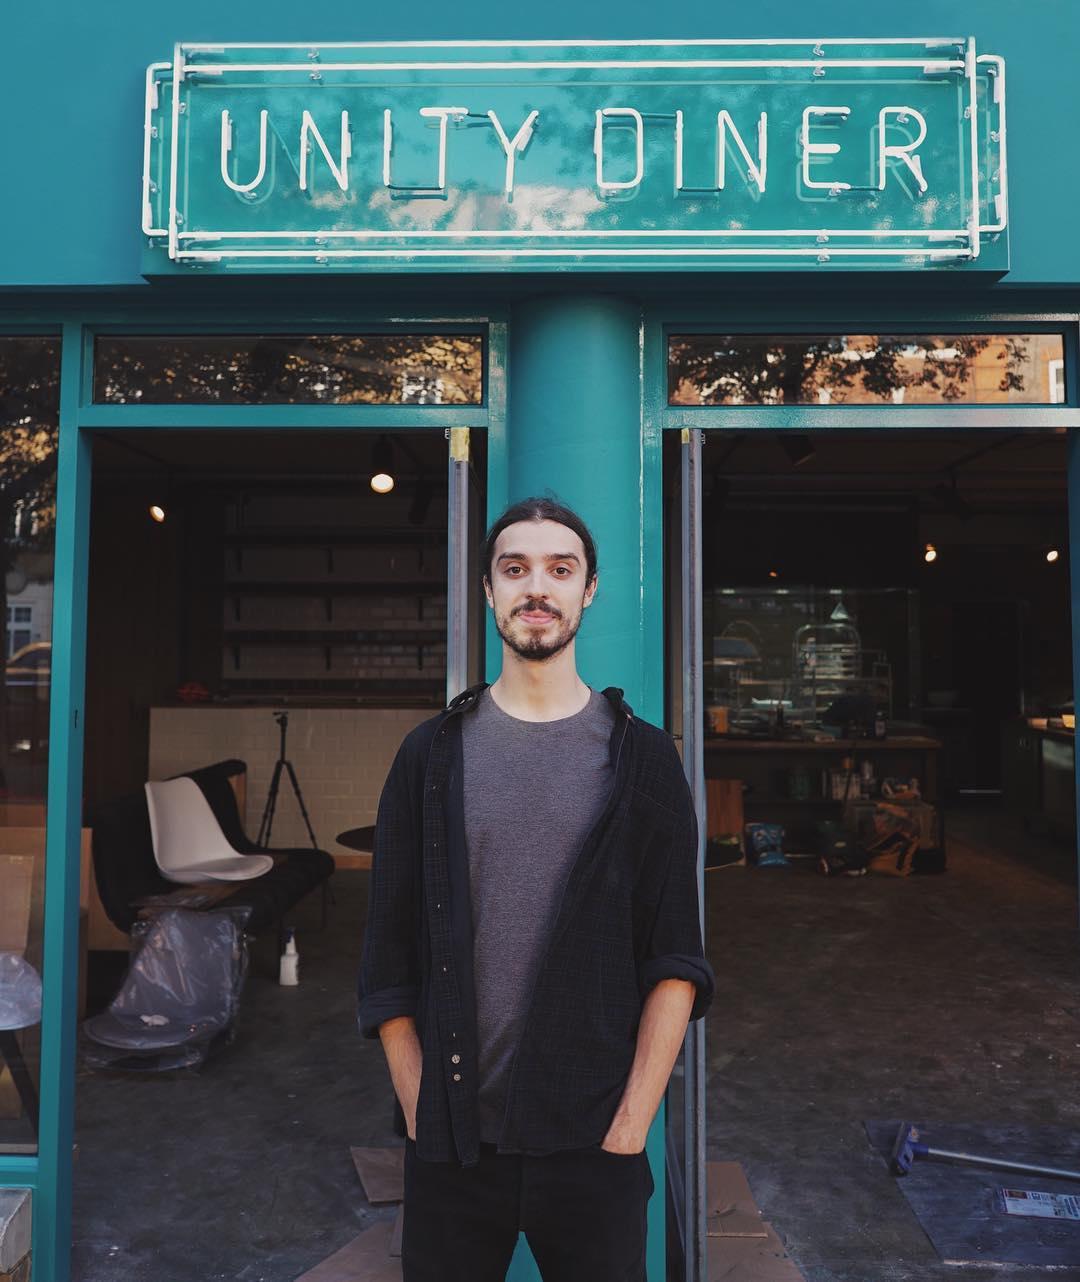 unity-diner-vegan-restaurant